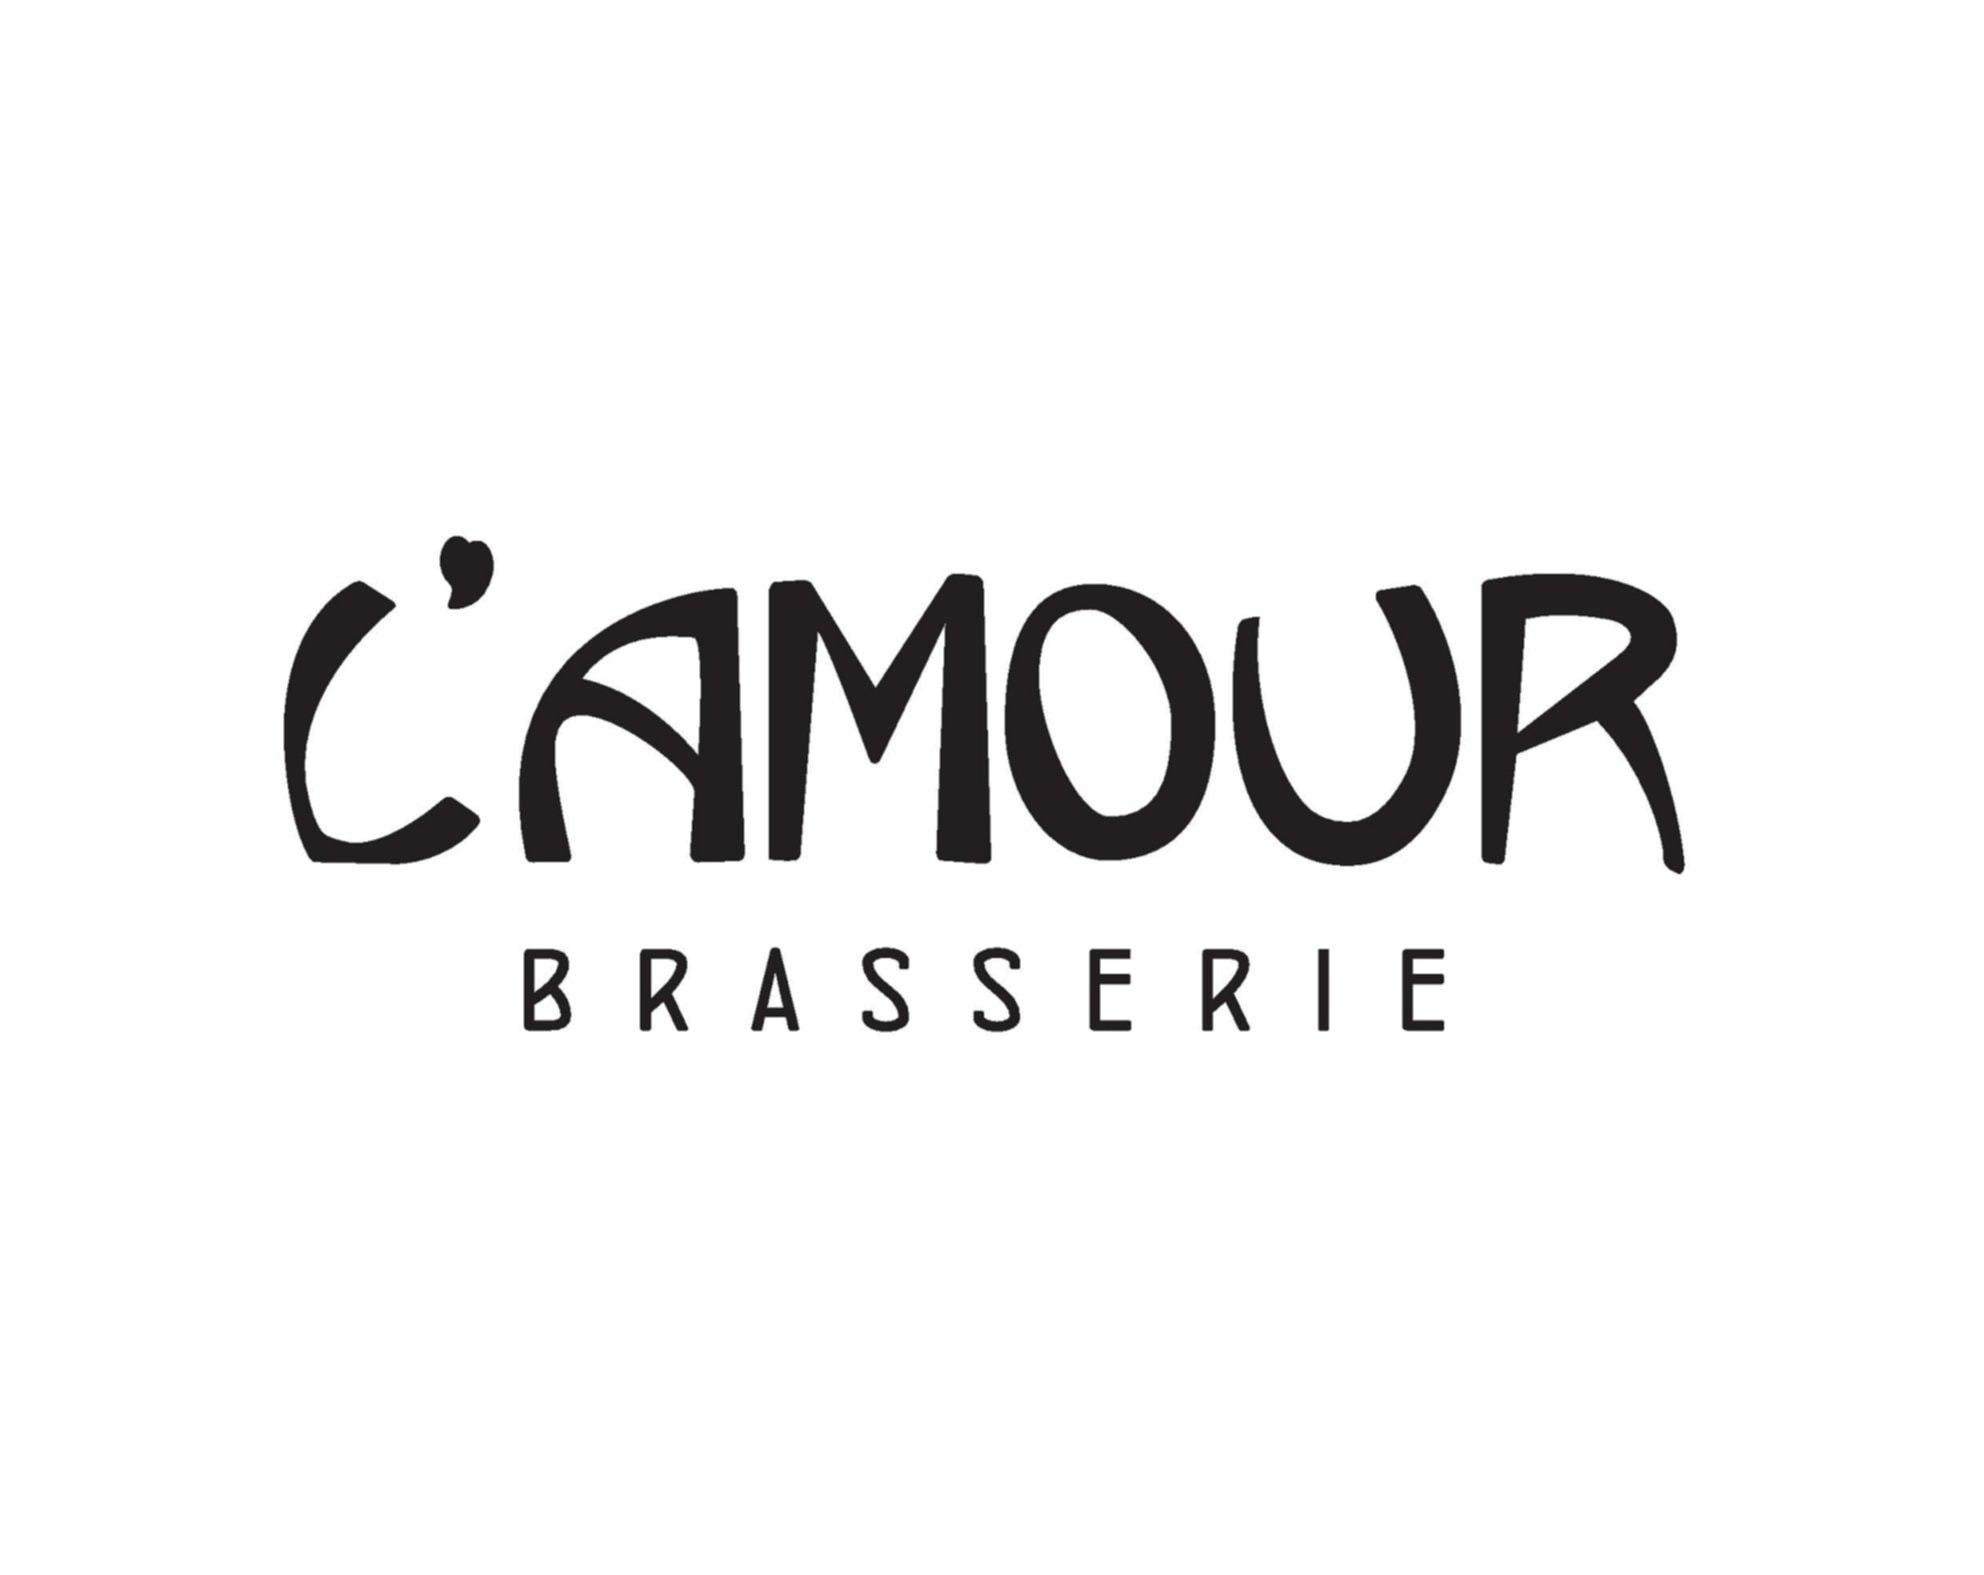 Brasserie L'amour